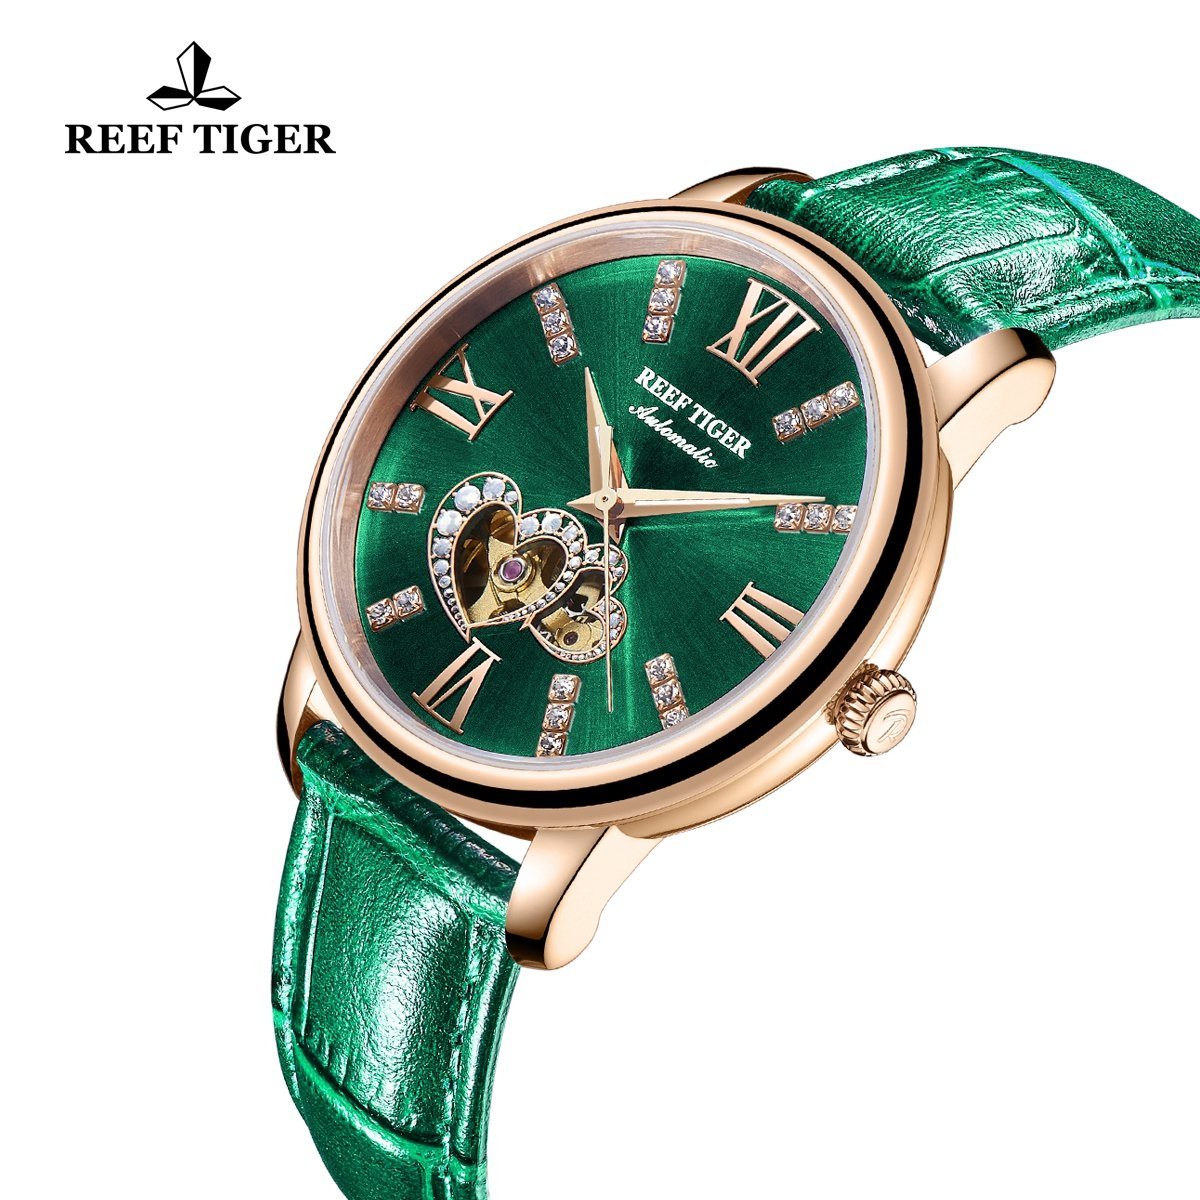 Đồng hồ Reef Tiger RGA1580-PNN